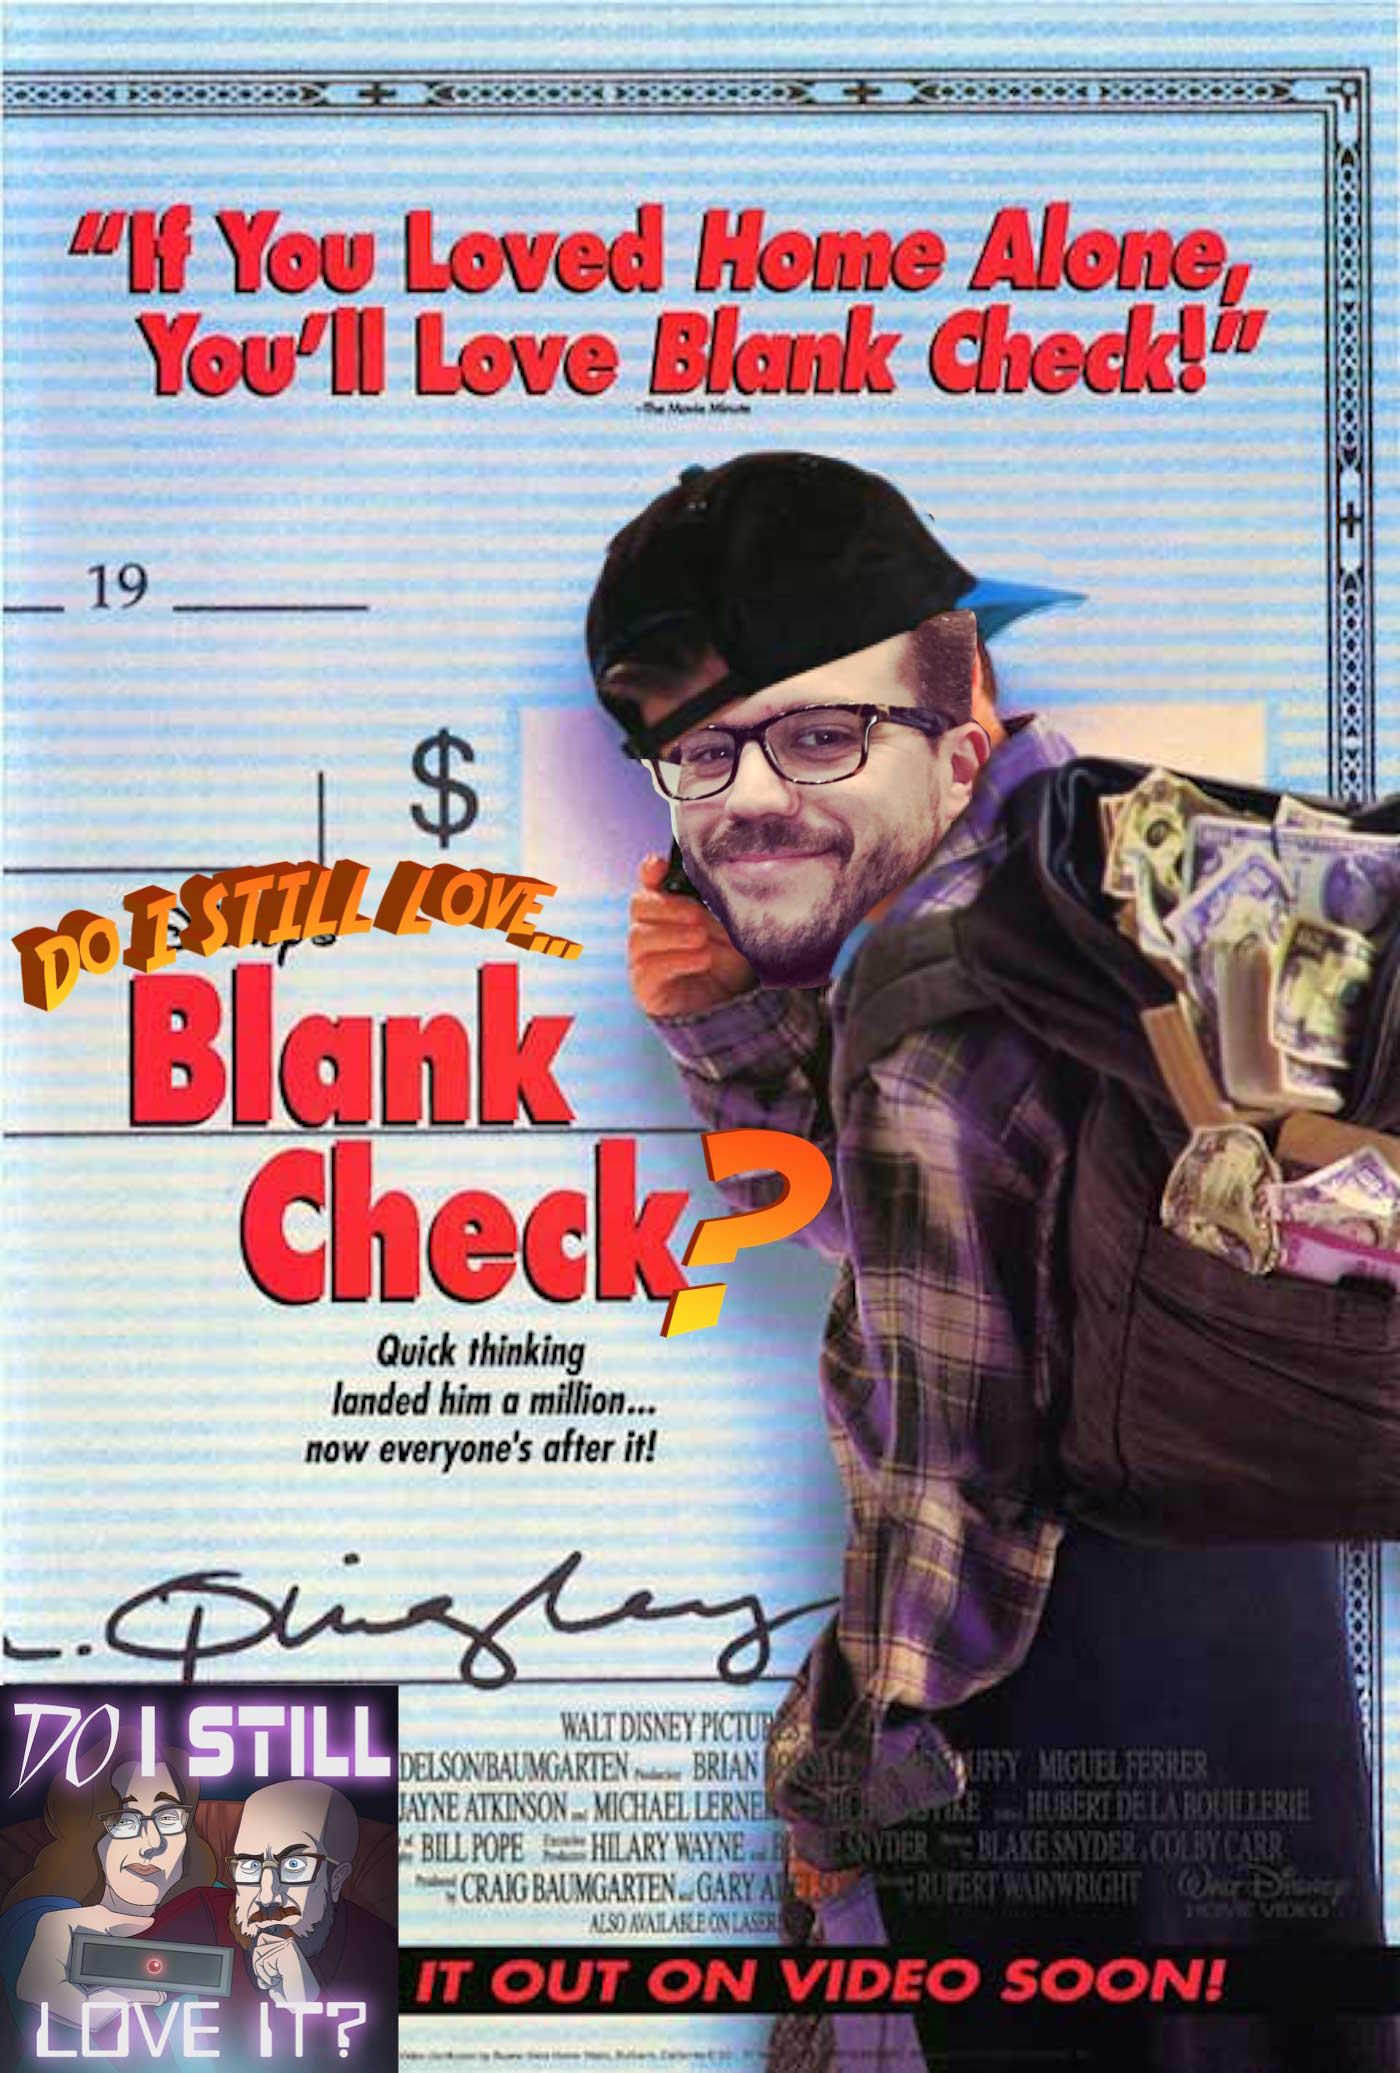 DISL_Blank_Check